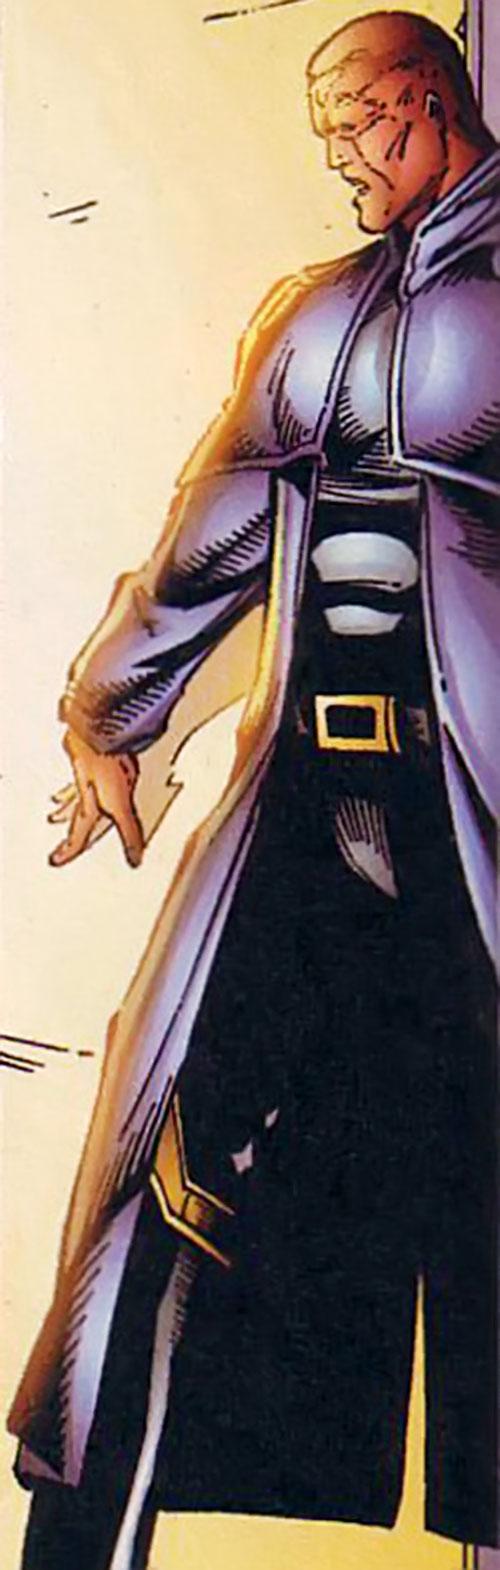 Hulver Ramik (Supreme enemy) (Image comics) in modern garb